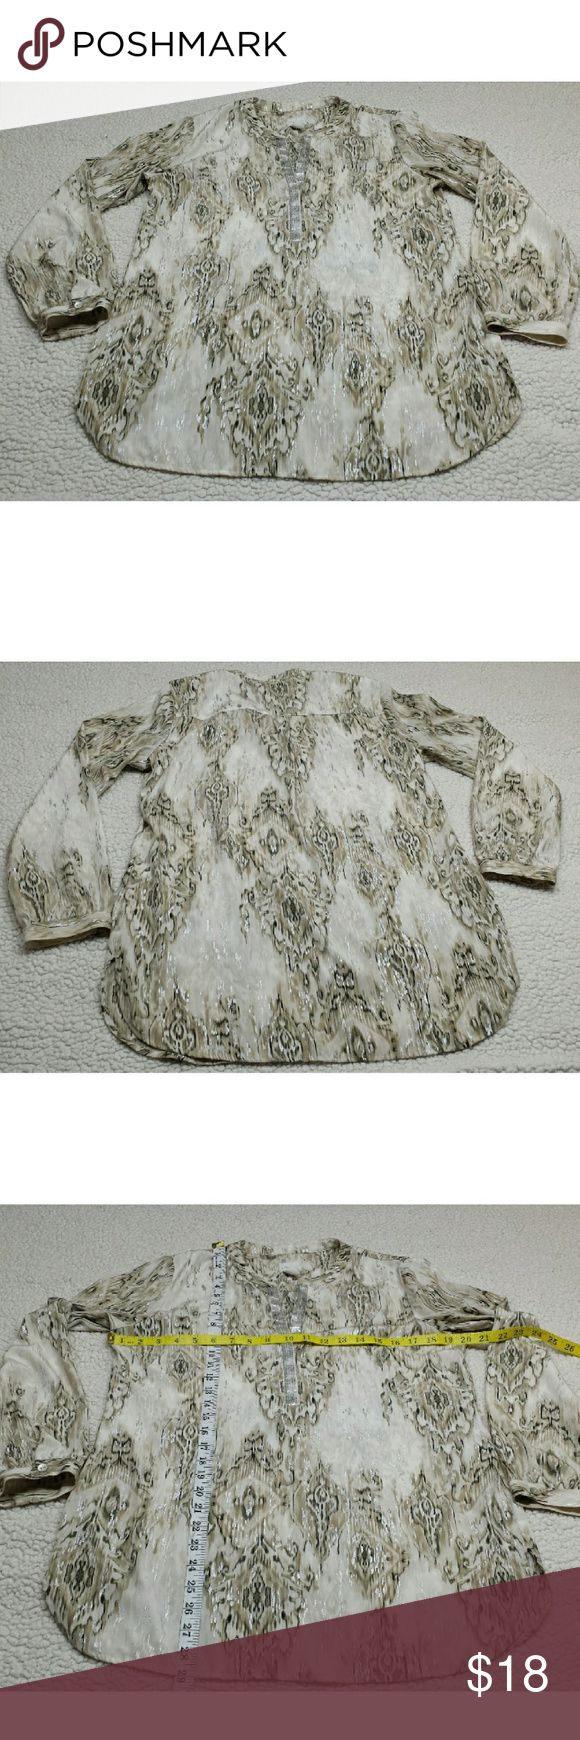 chico's tunic size 0 Chicks 1 women's metallic shimmer sequin tunic top v - neck long sleeve shirt SZ 1 Chico's Tops Tunics